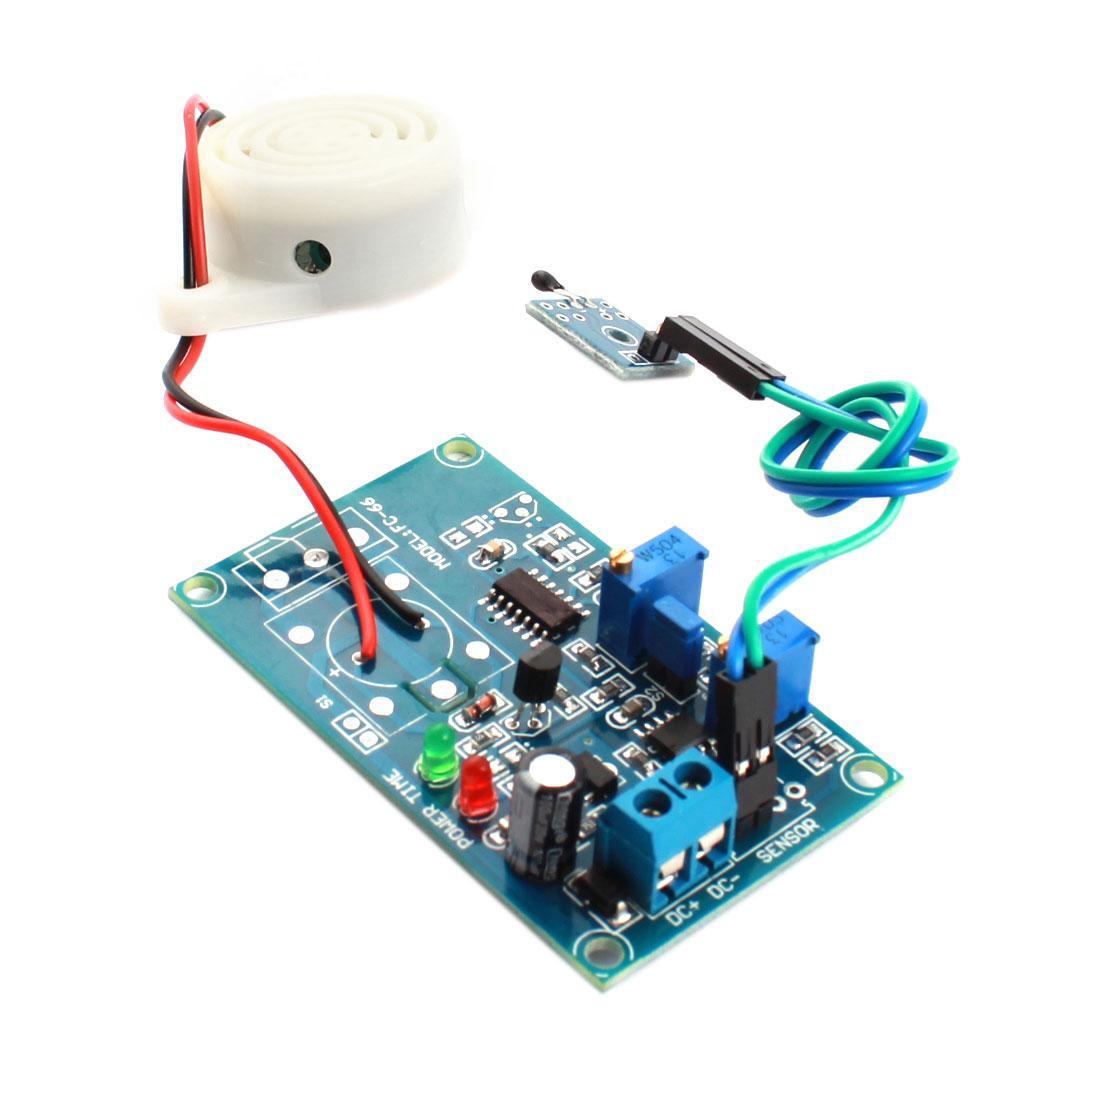 FC-66 DC 24V 0-20S High Temperature Trigger Thermal Detect Delay Alarm Buzzer Module Green